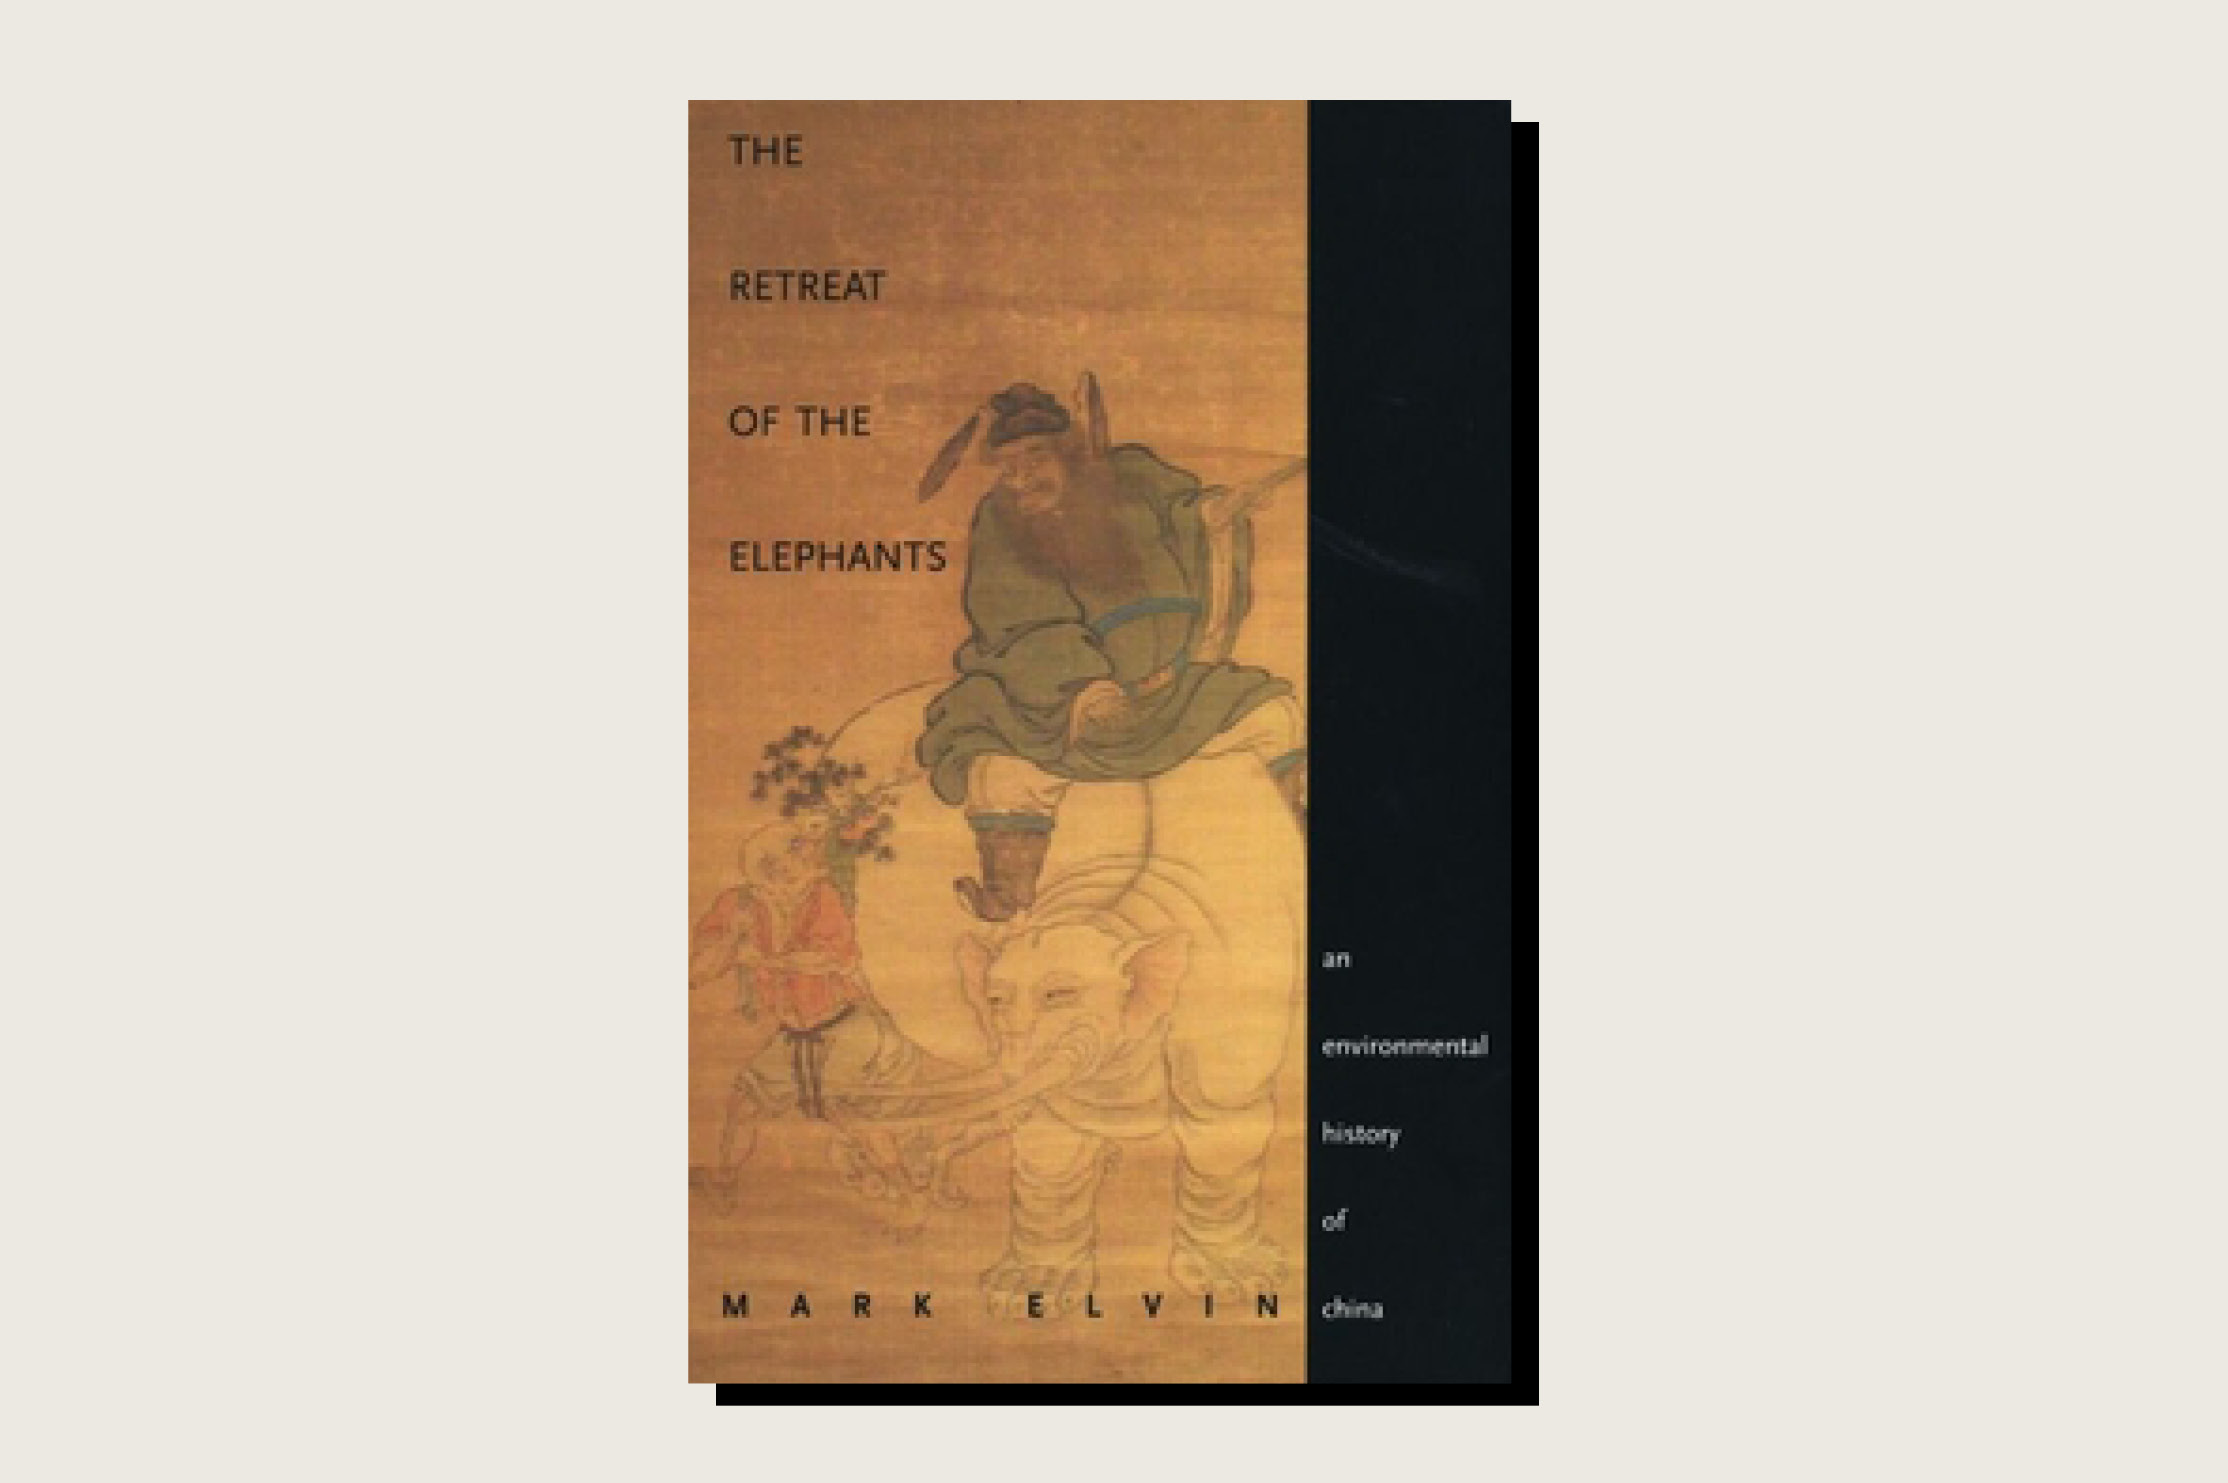 <em>The Retreat of the Elephants: An Environmental History of China</em>, Mark Elvin, Yale University Press, 2006, 592pp., .